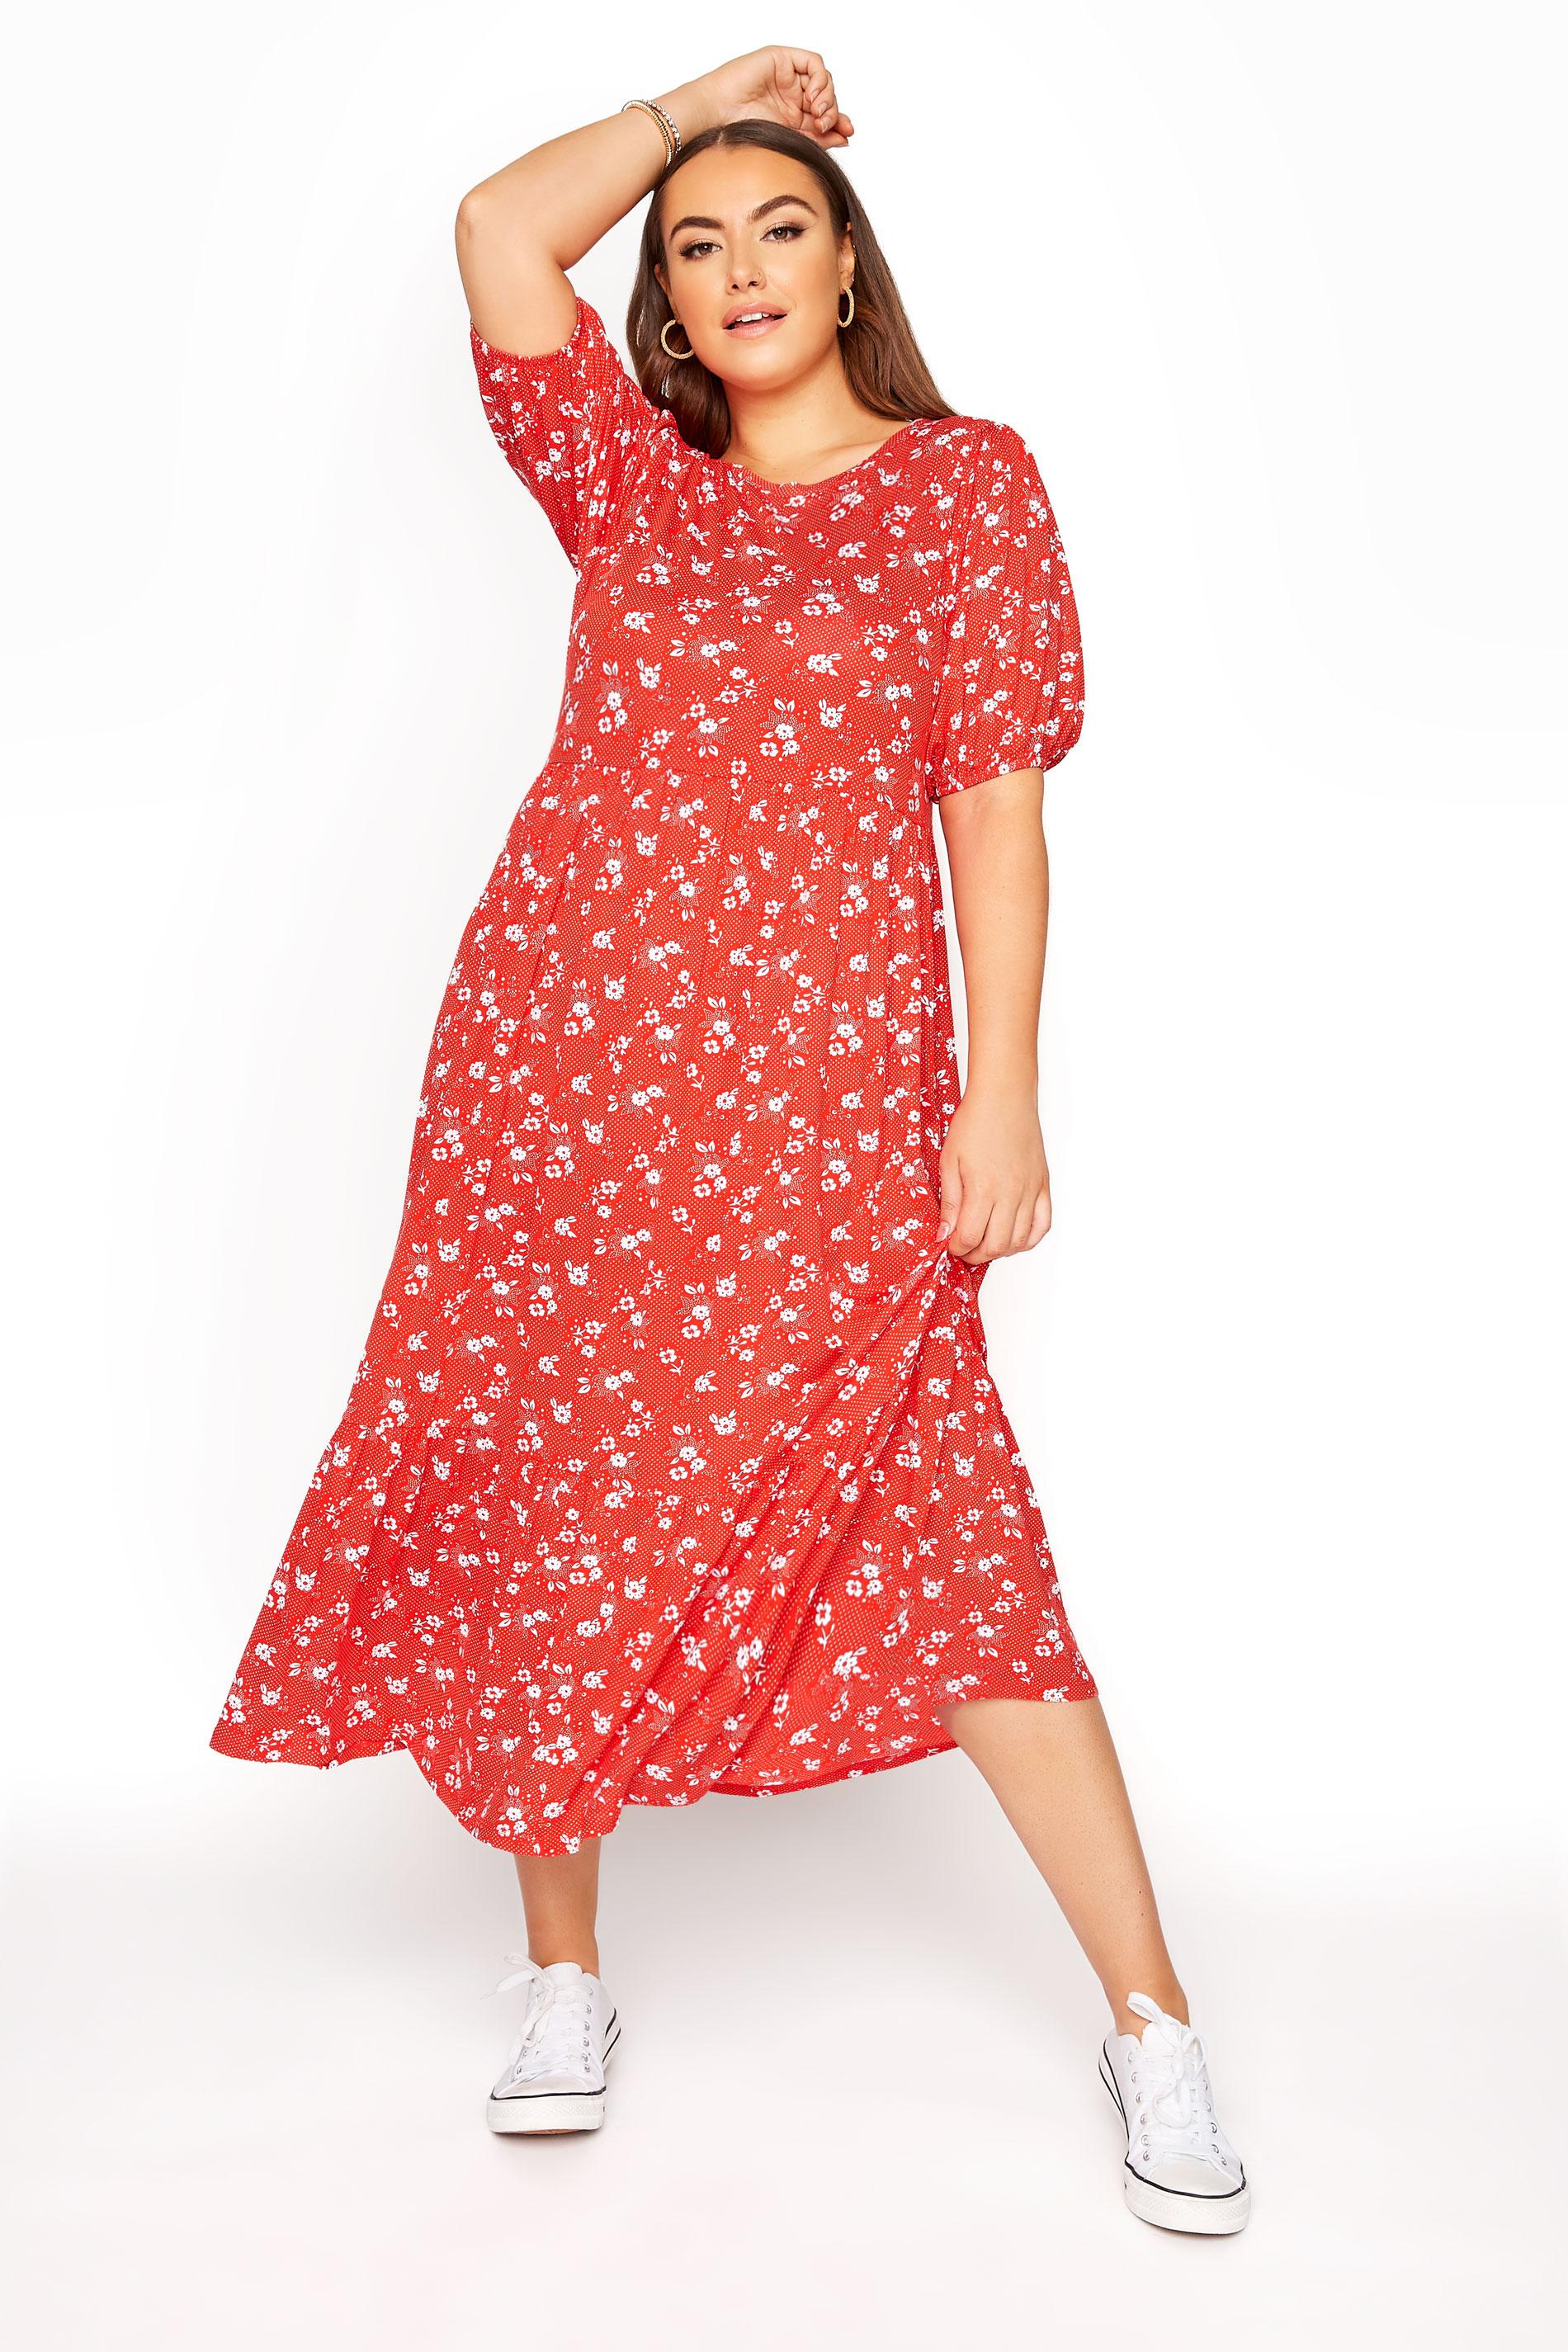 Red Floral Short Sleeve Midi Dress_A.jpg